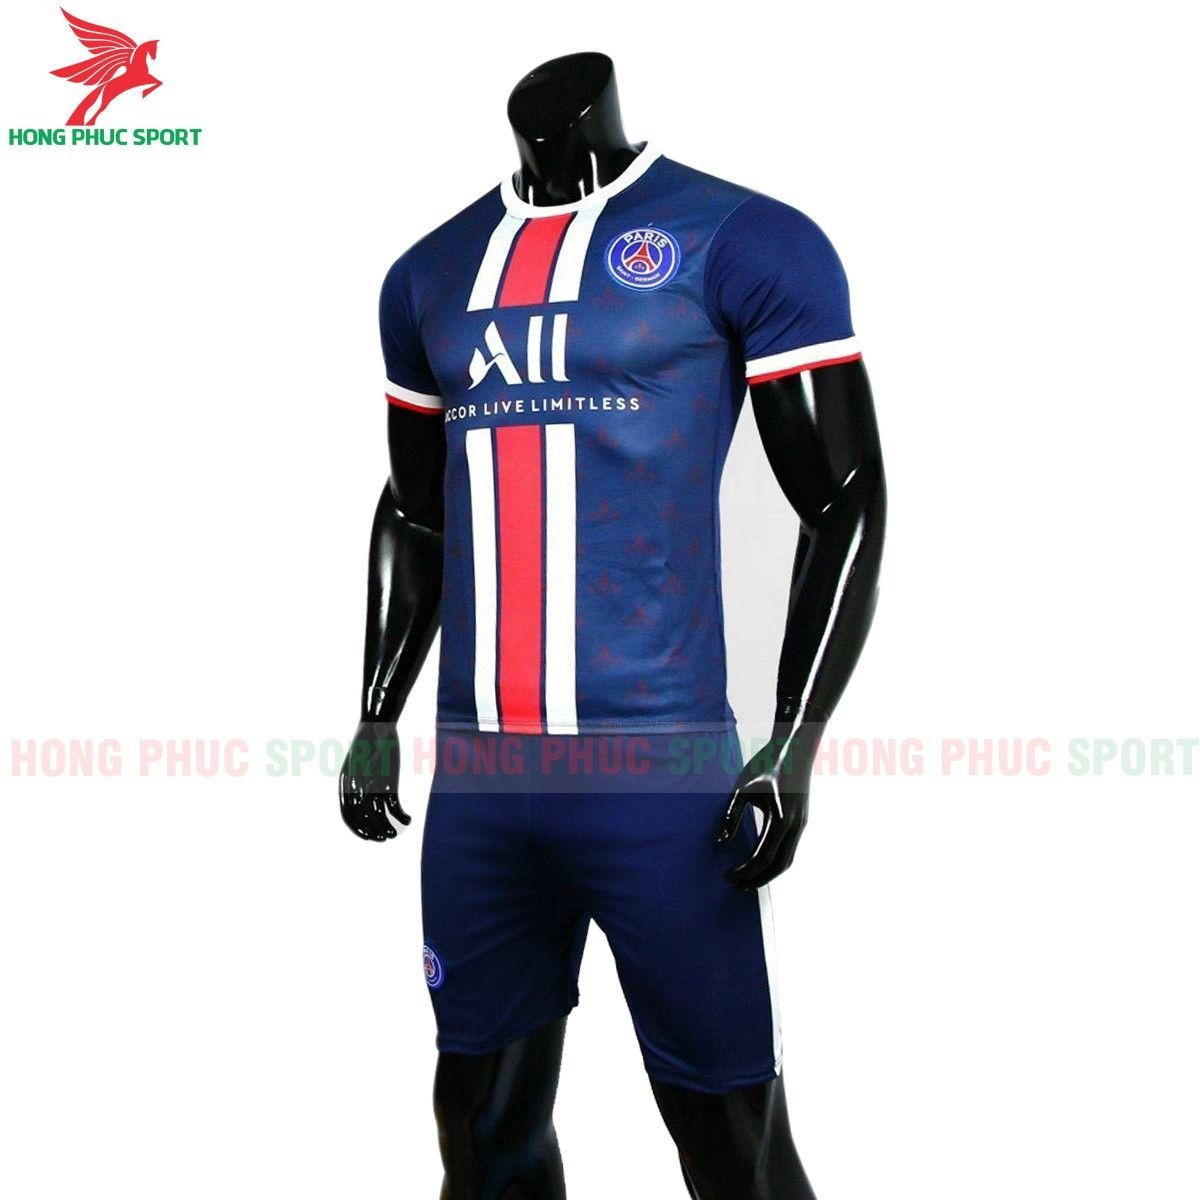 https://cdn.hongphucsport.com/unsafe/s4.shopbay.vn/files/285/ao-bong-da-psg-san-nha-2021-2022-60f253b7f1177.jpg